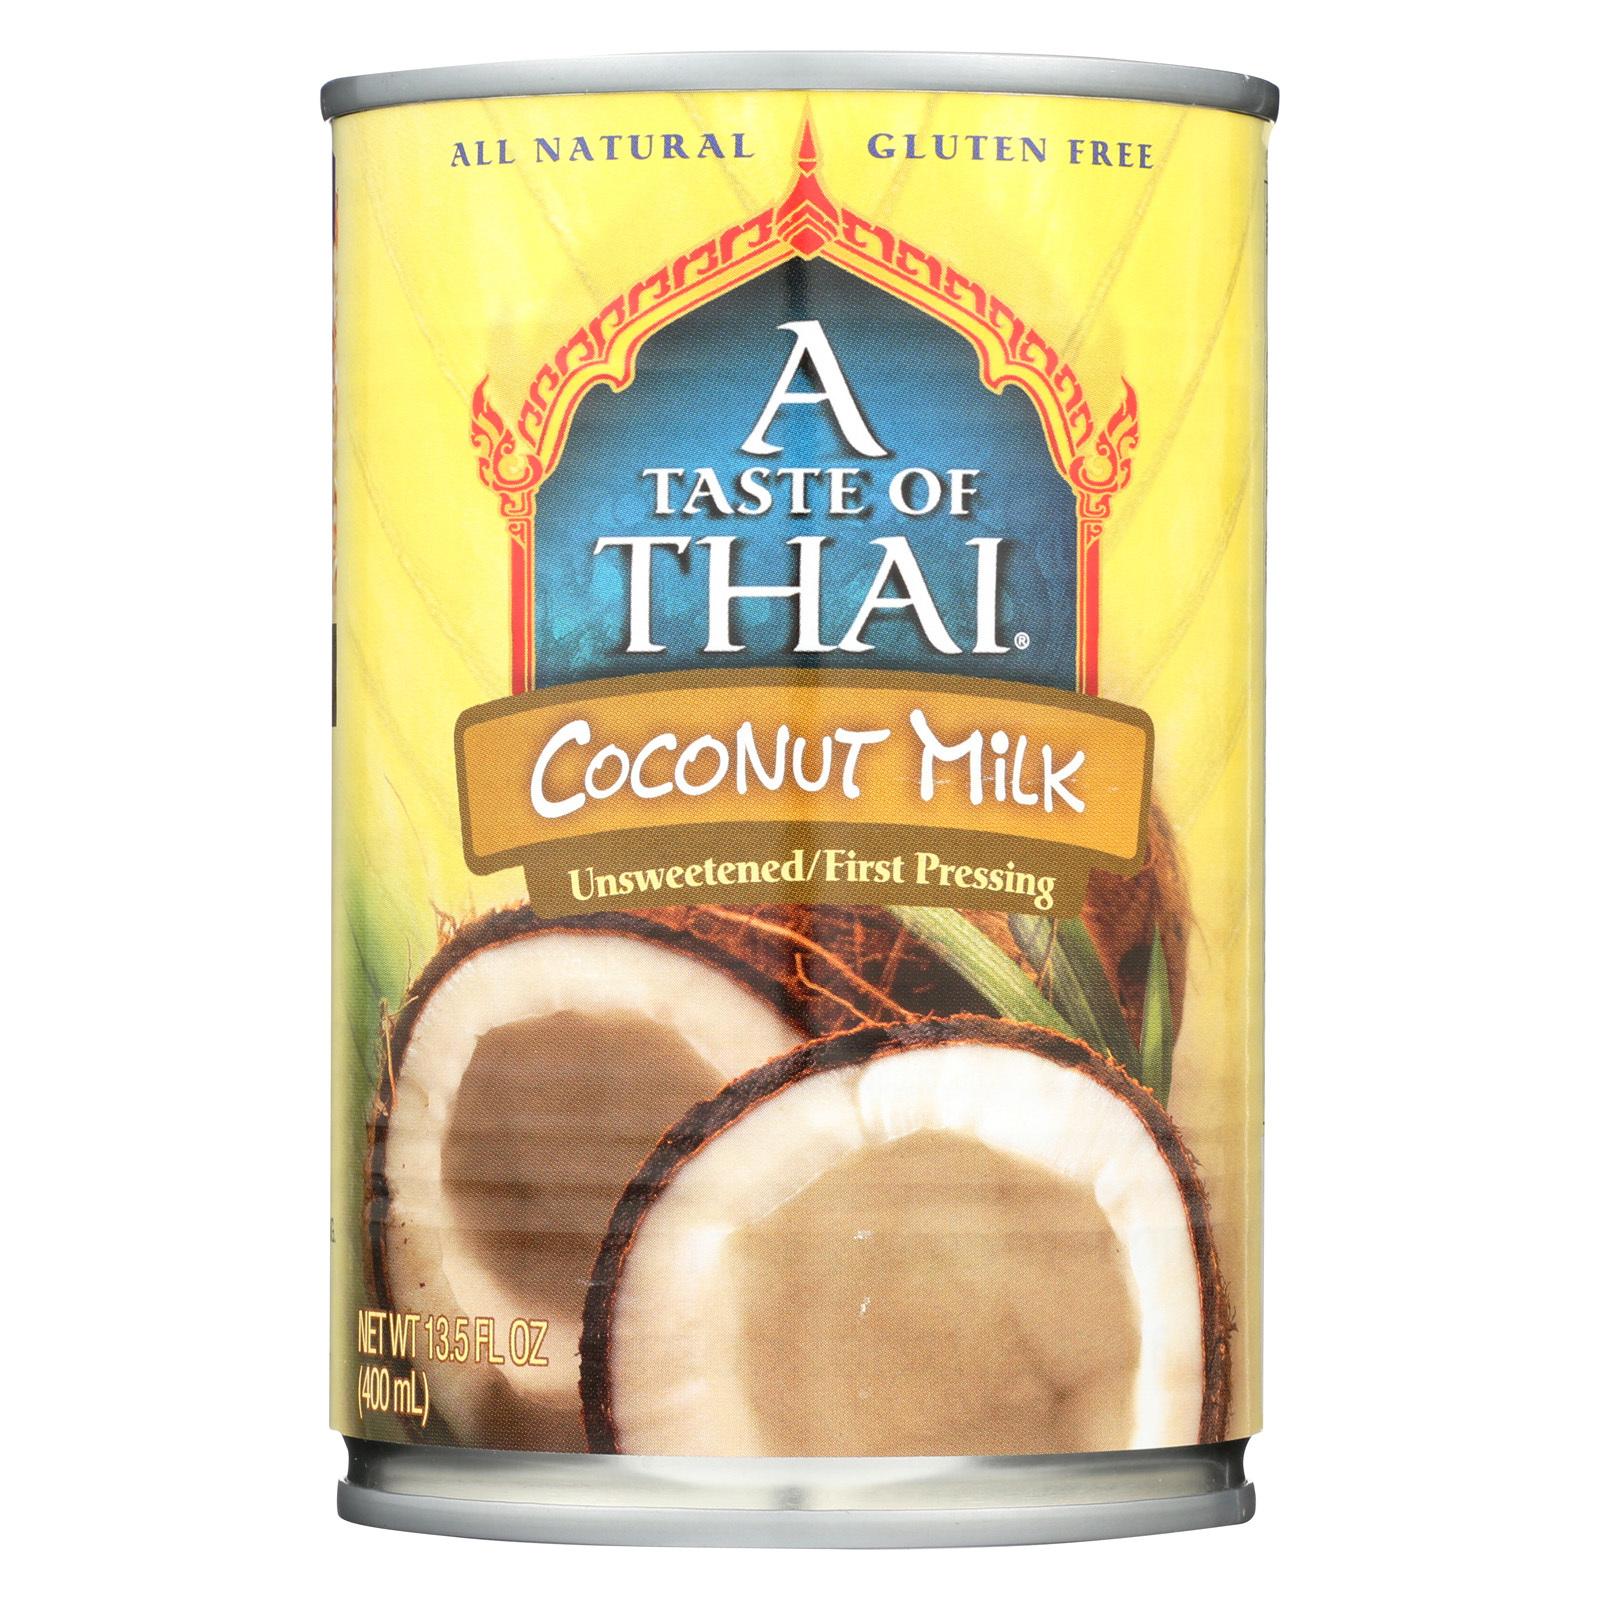 Taste of Thai Coconut Milk - 13.5 Fl oz.